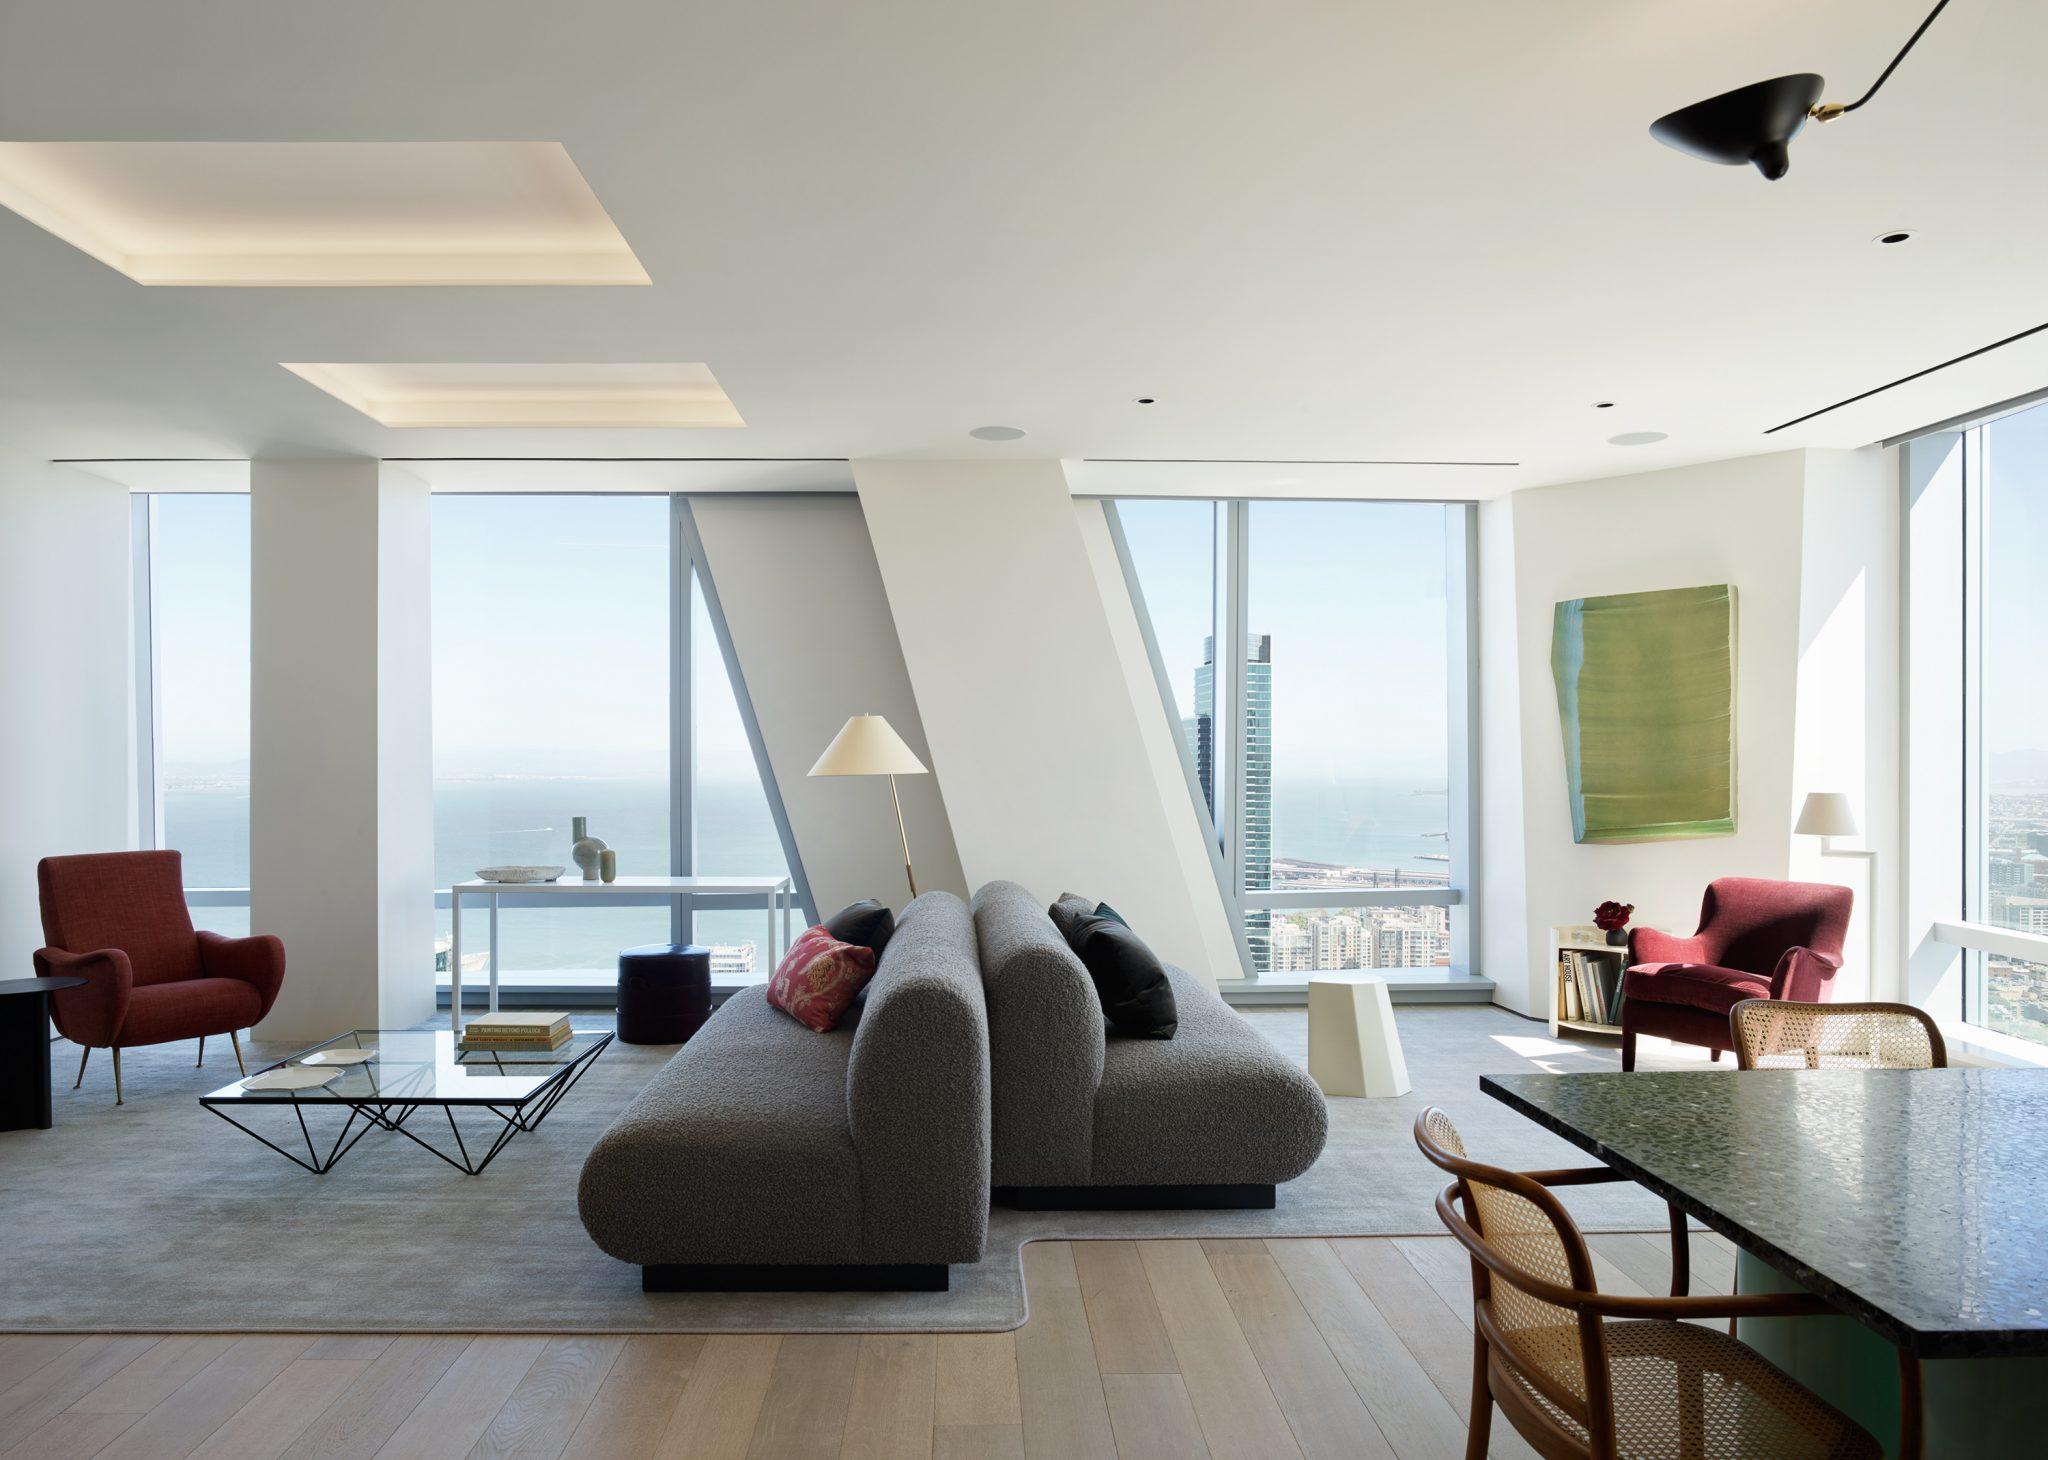 181 Fremont - Interior Photography